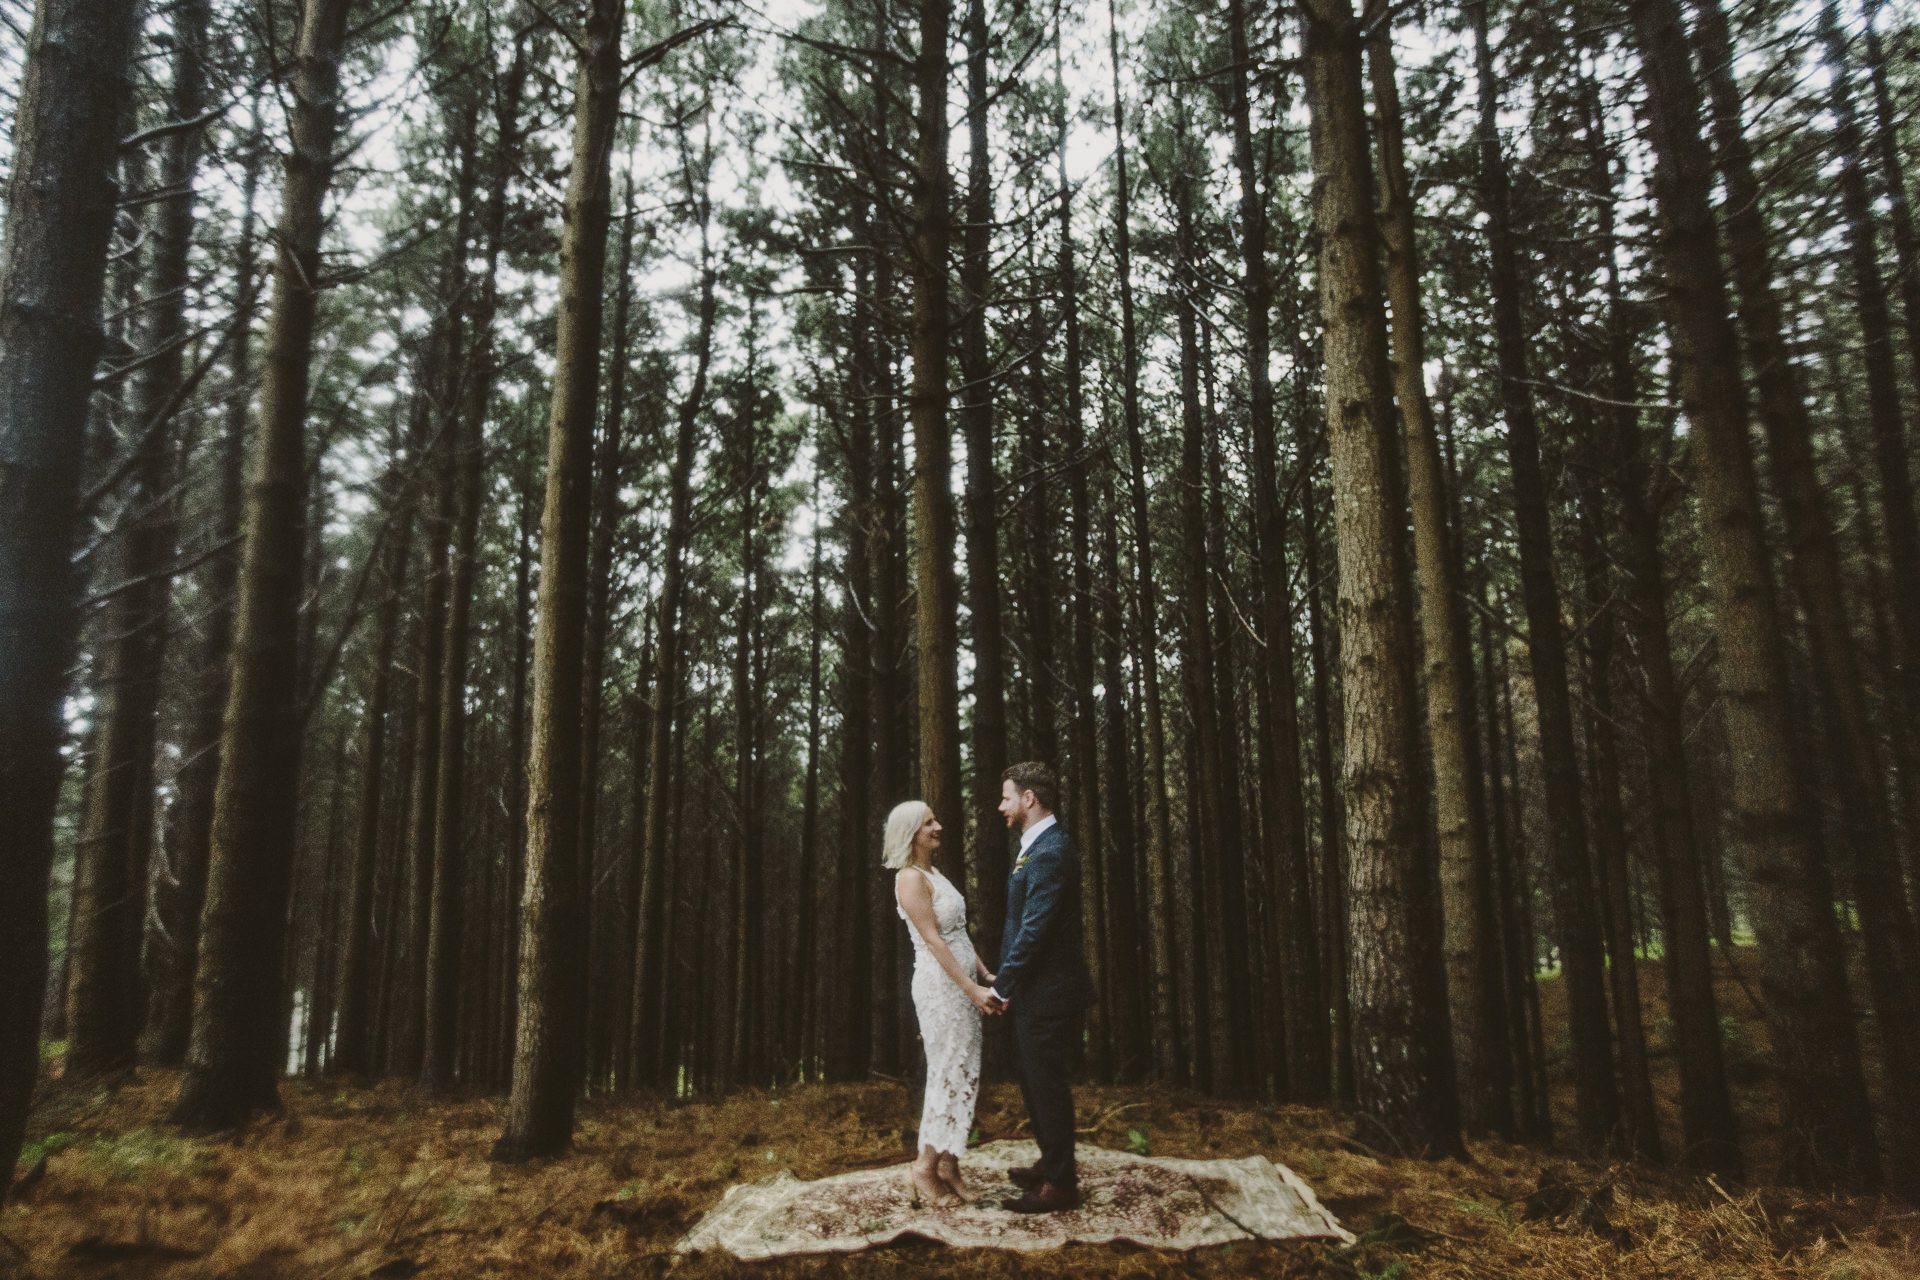 hamilton-wedding-portrait-photographer-at-205